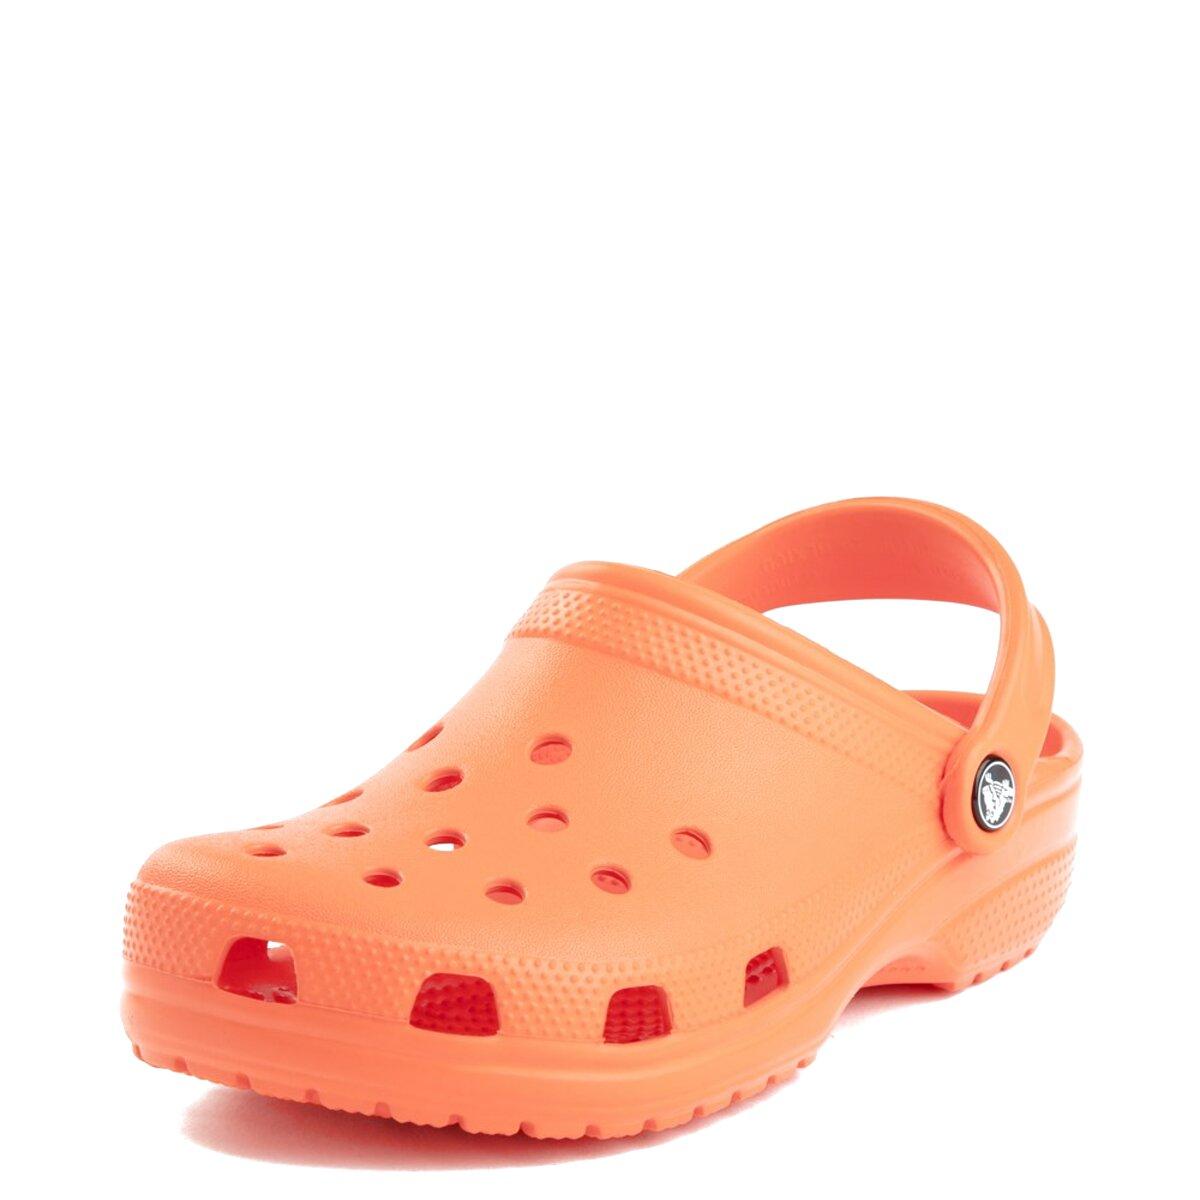 orange crocs for sale